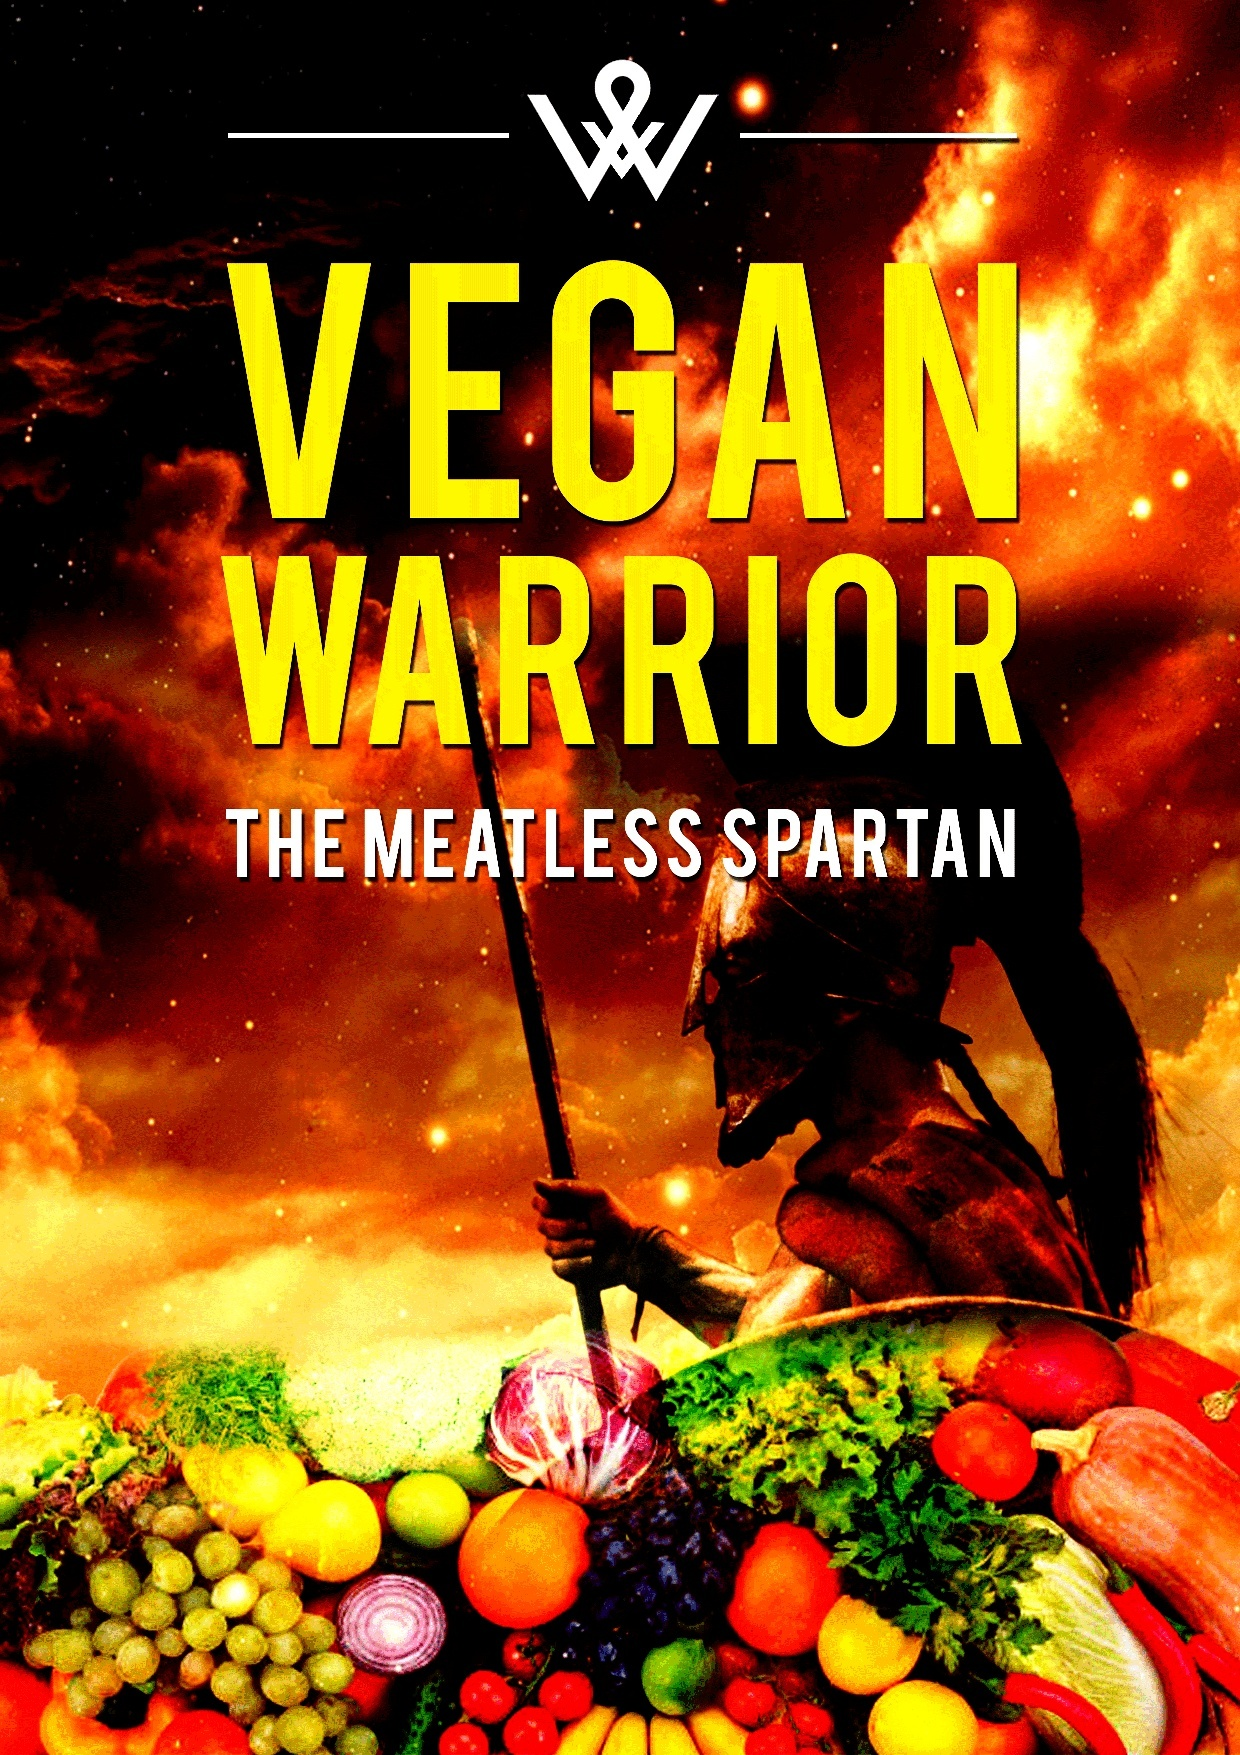 Vegan Warrior - The Meatless Spartan